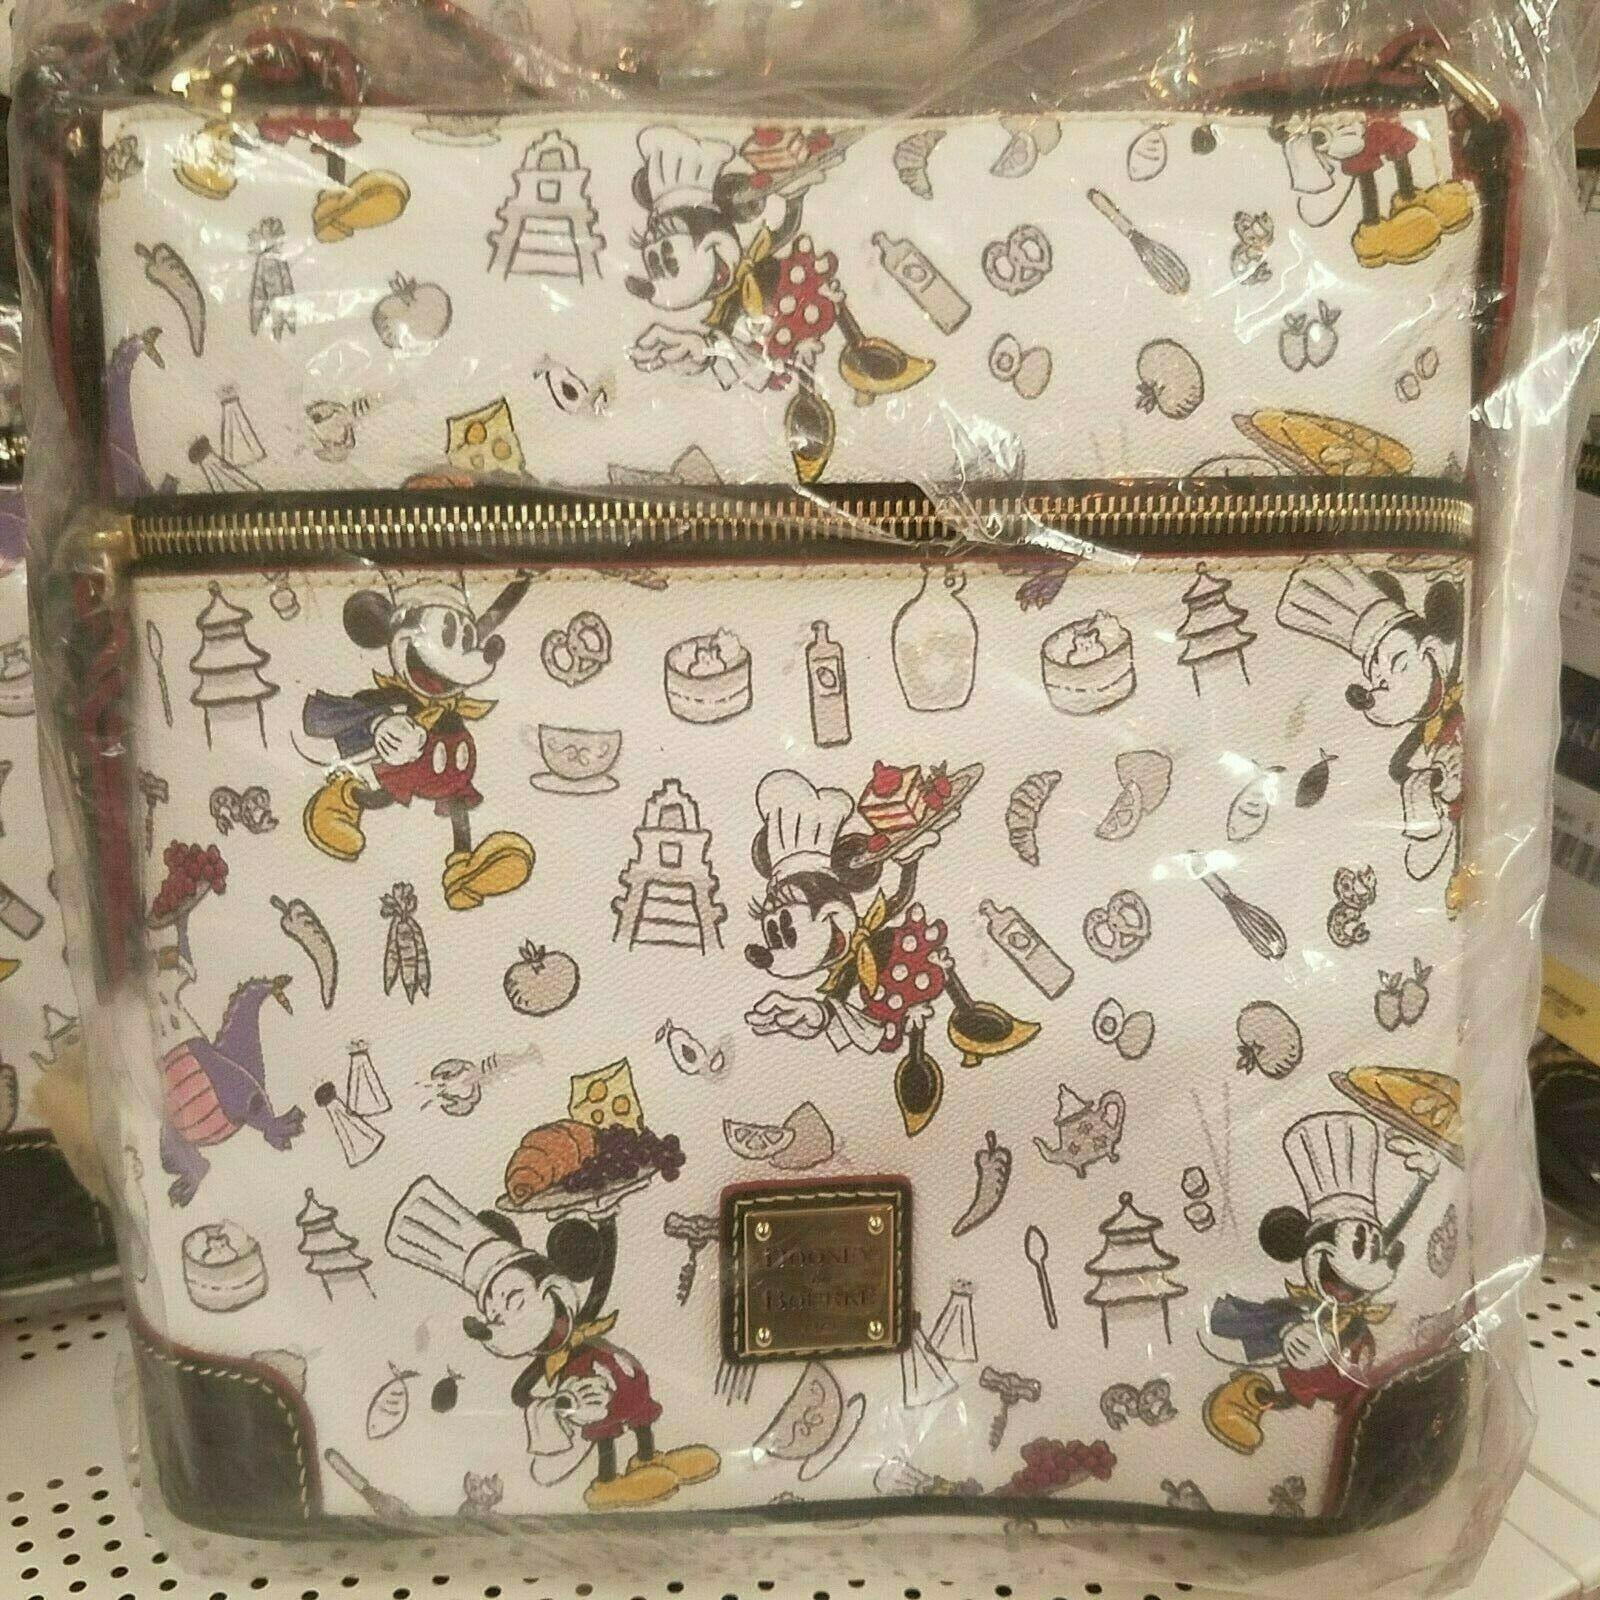 Disney Dooney & Bourke Mickey Mouse 2018 Food and Wine Festival Crossbody Bag - $247.49